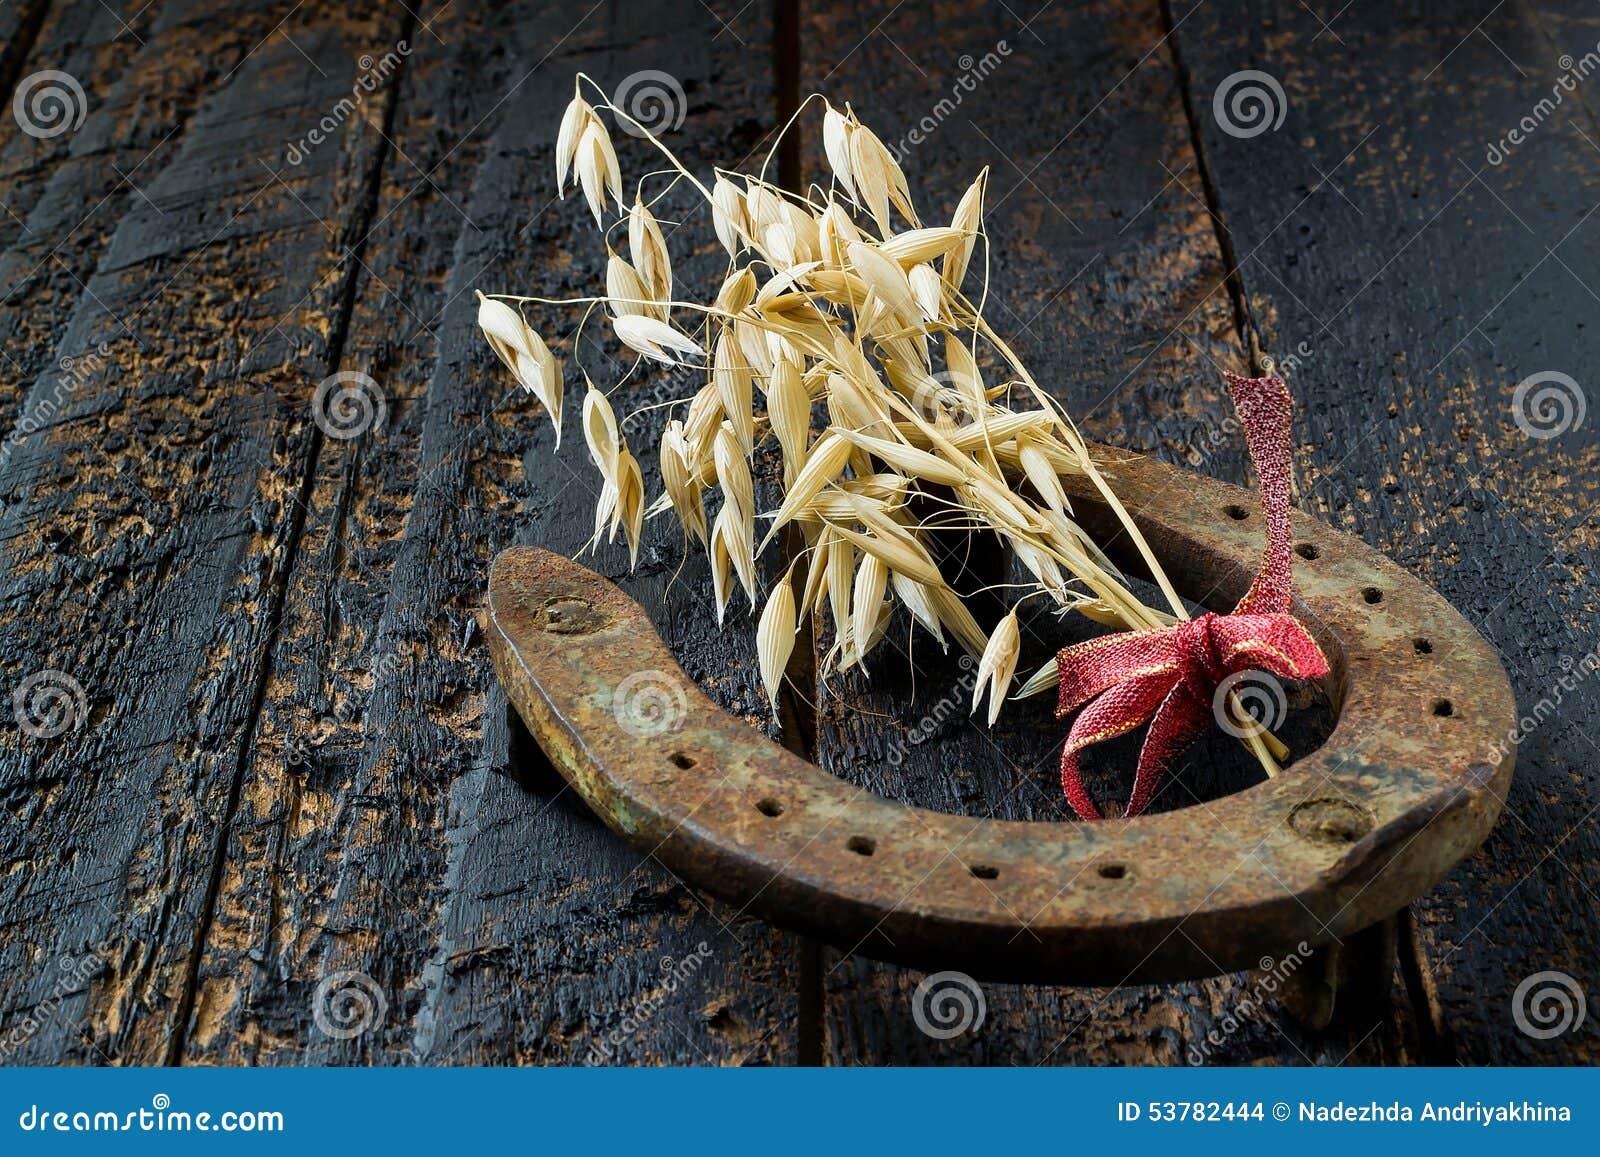 Horseshoe And Oats Symbols Of Good Luck And Prosperity Stock Photo